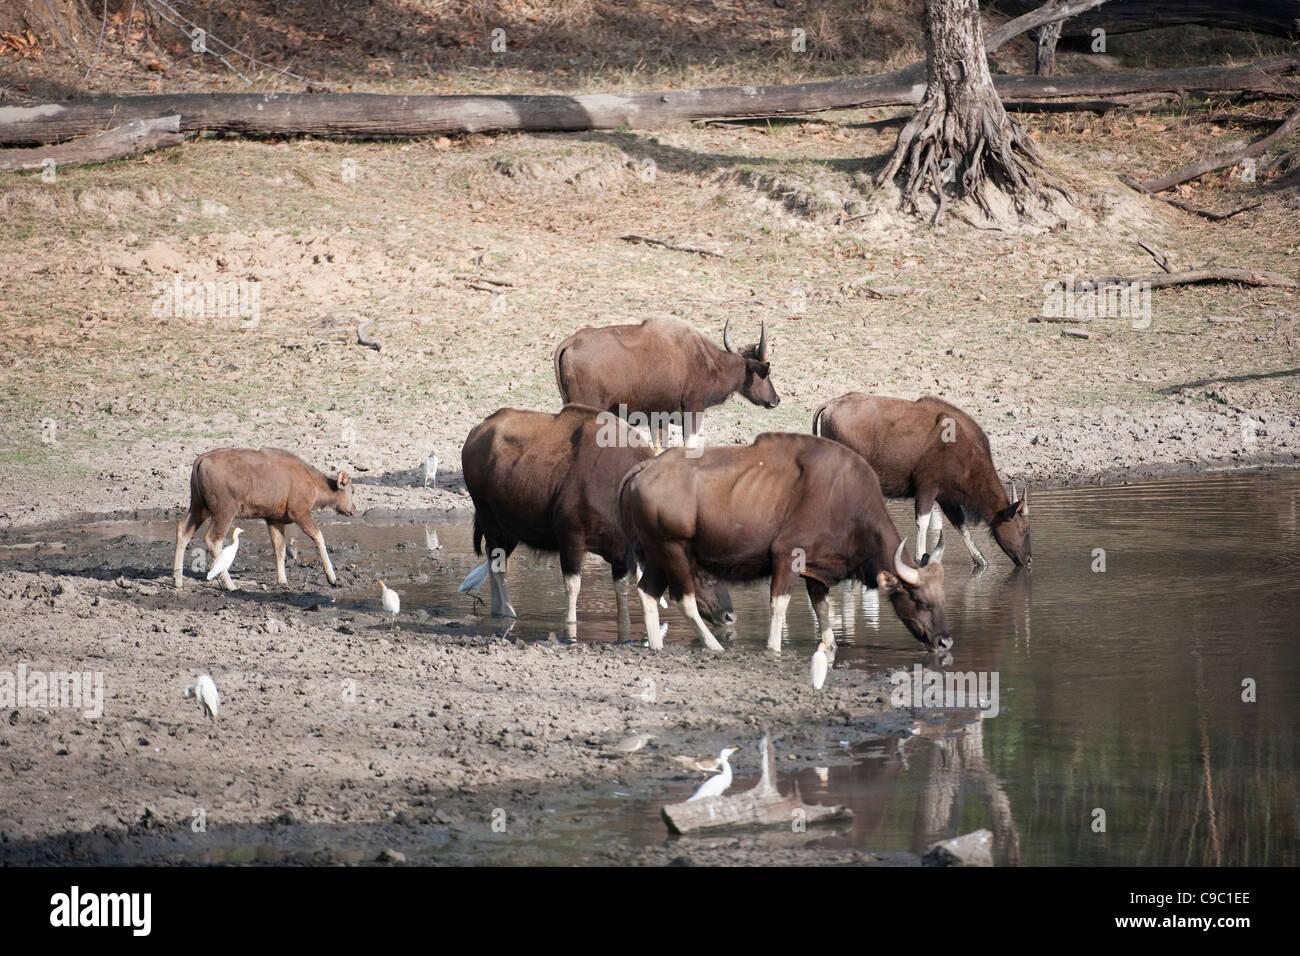 Gaur Bos gaurus Kanha national park India - Stock Image